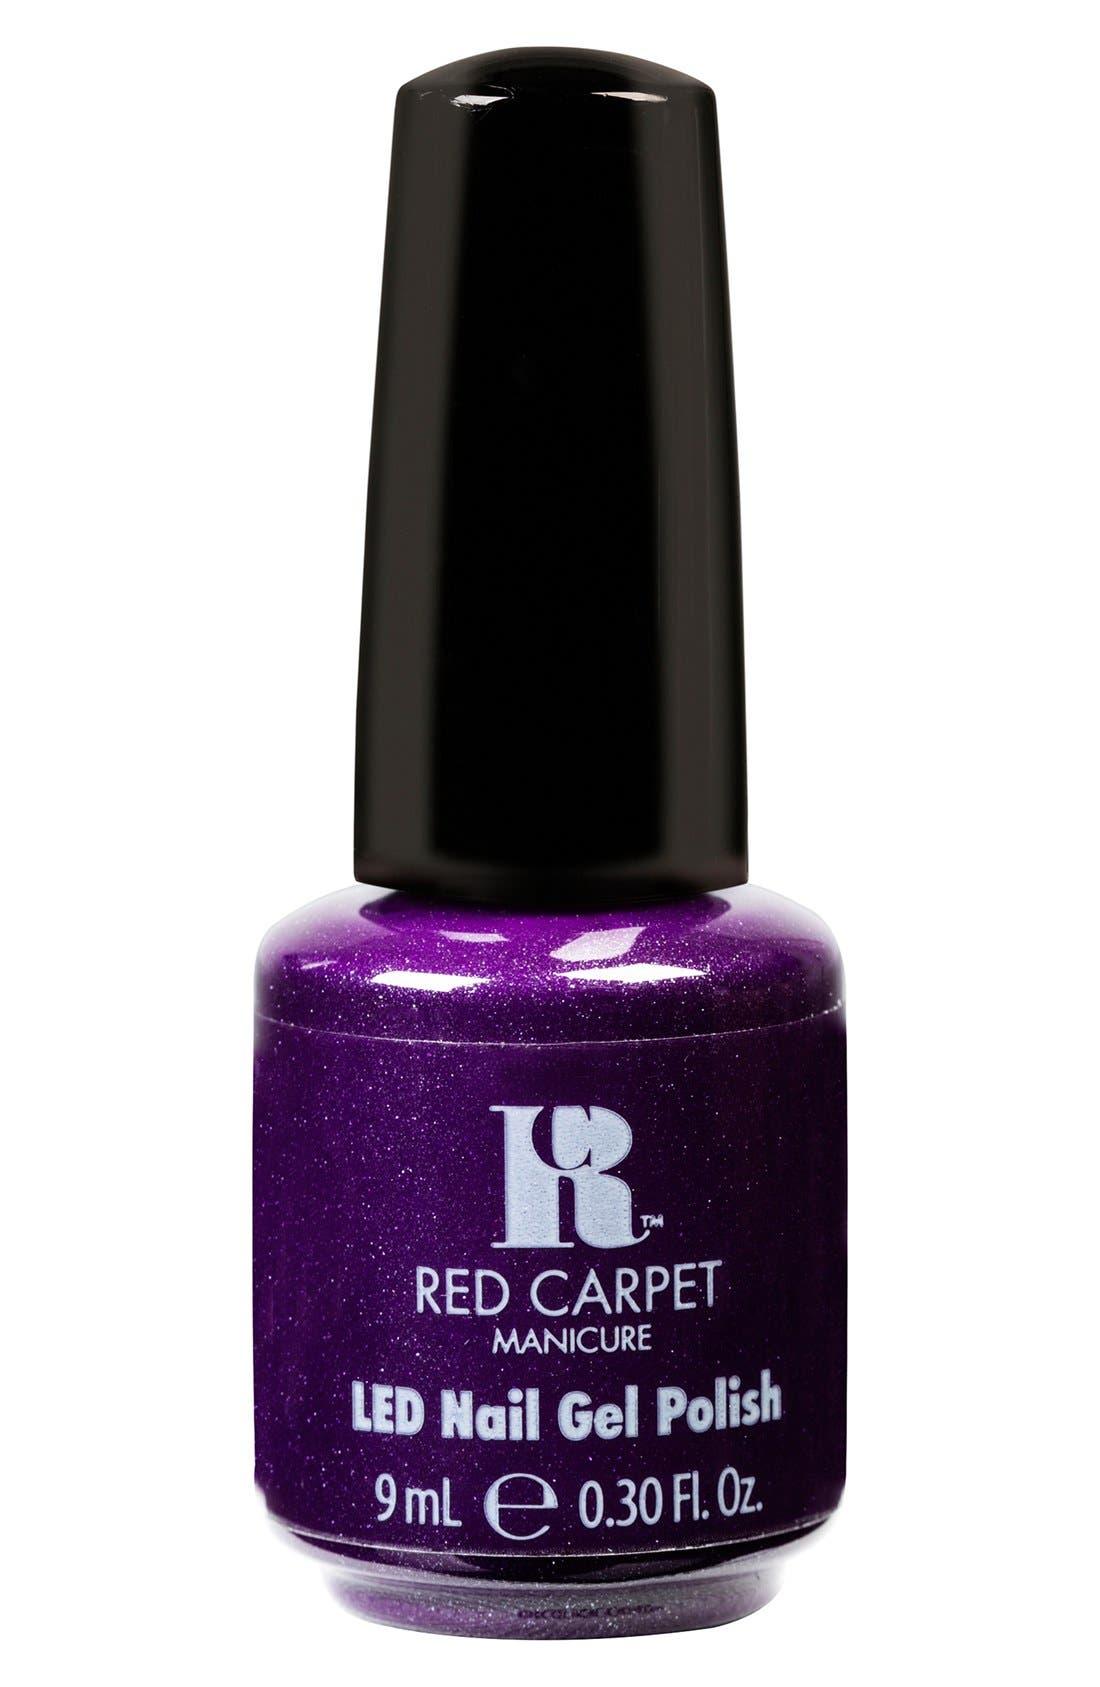 Red Carpet Manicure 'Power of the Gem' Gel Polish